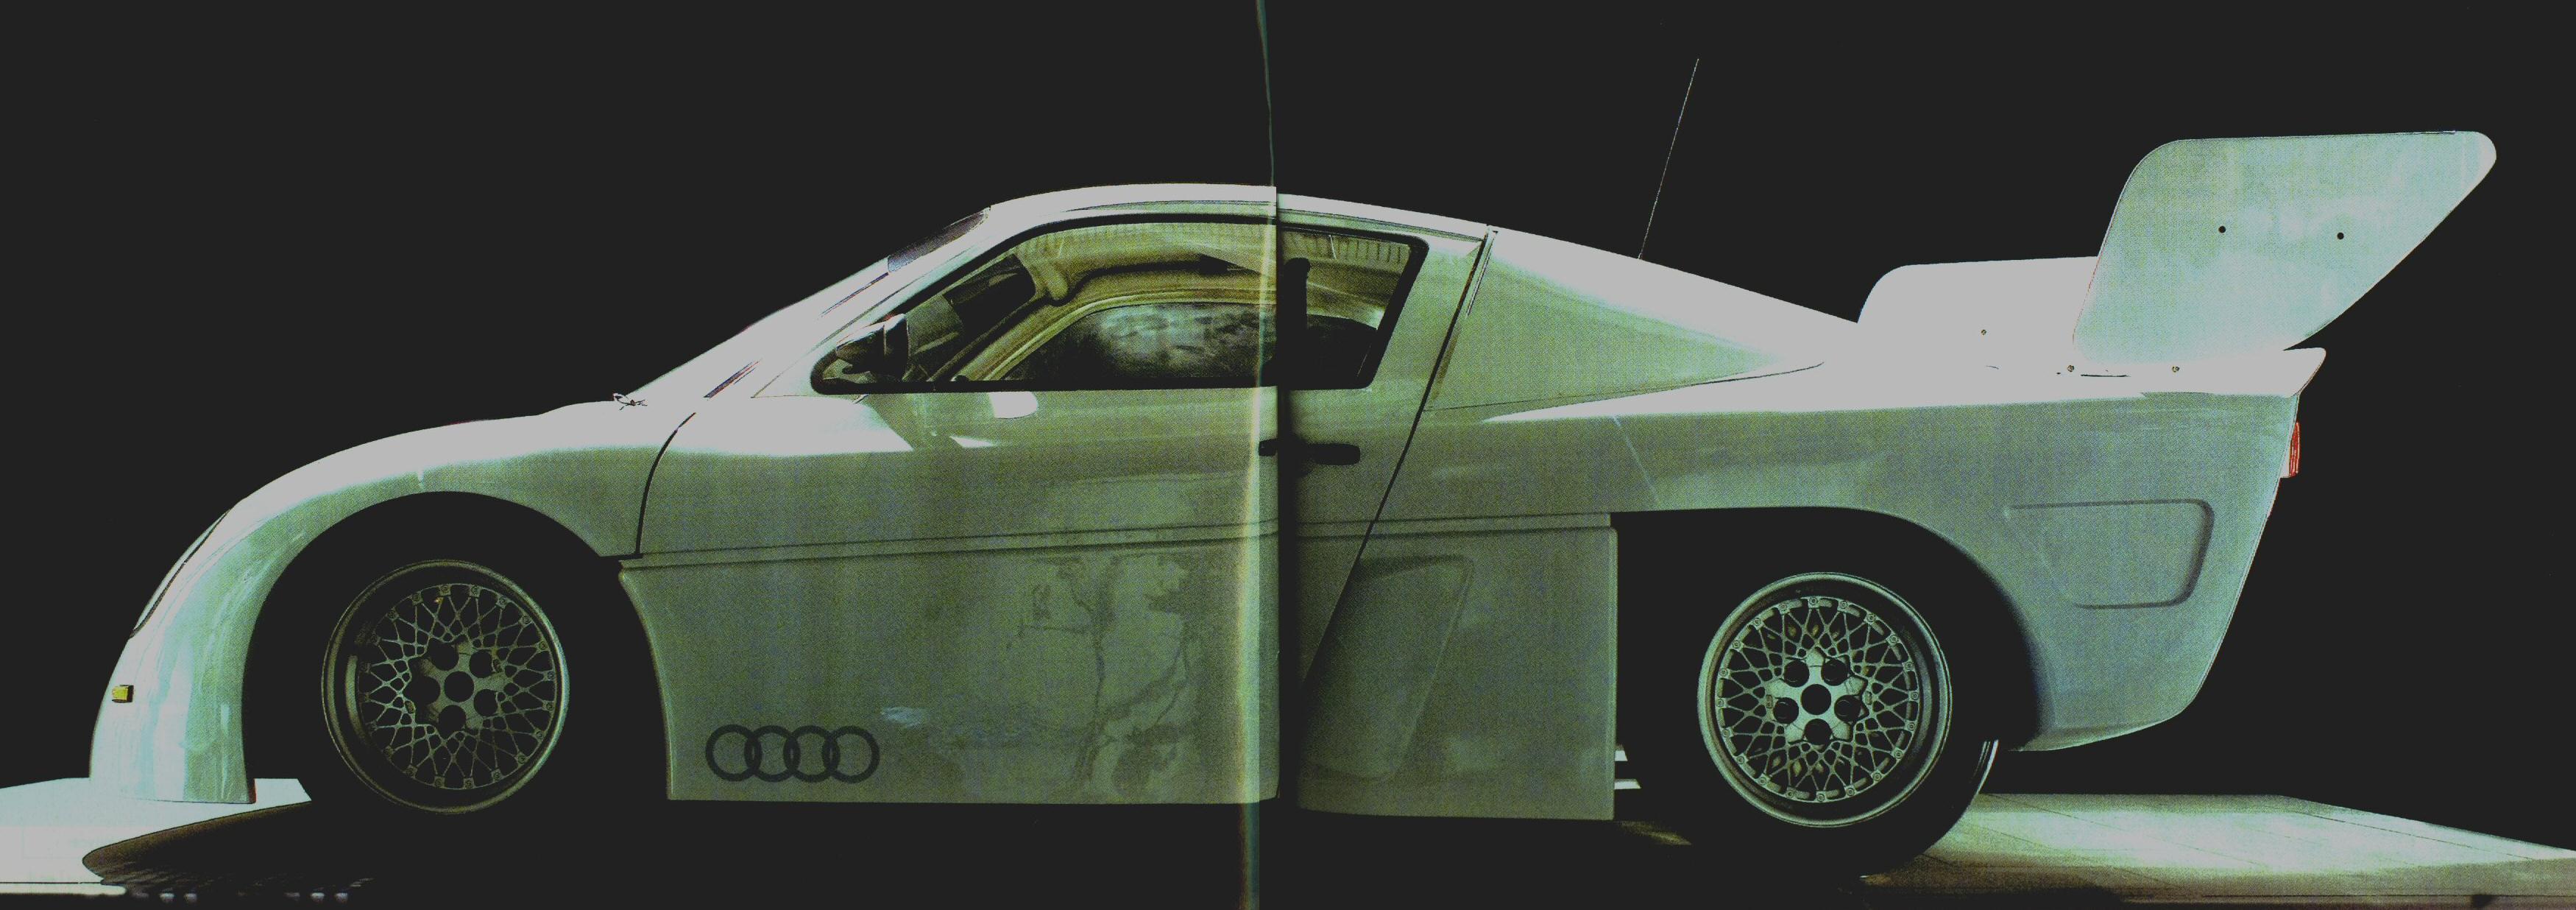 Audi Quattro Rally >> Group S and the 'secret' Audi prototype. | IEDEI